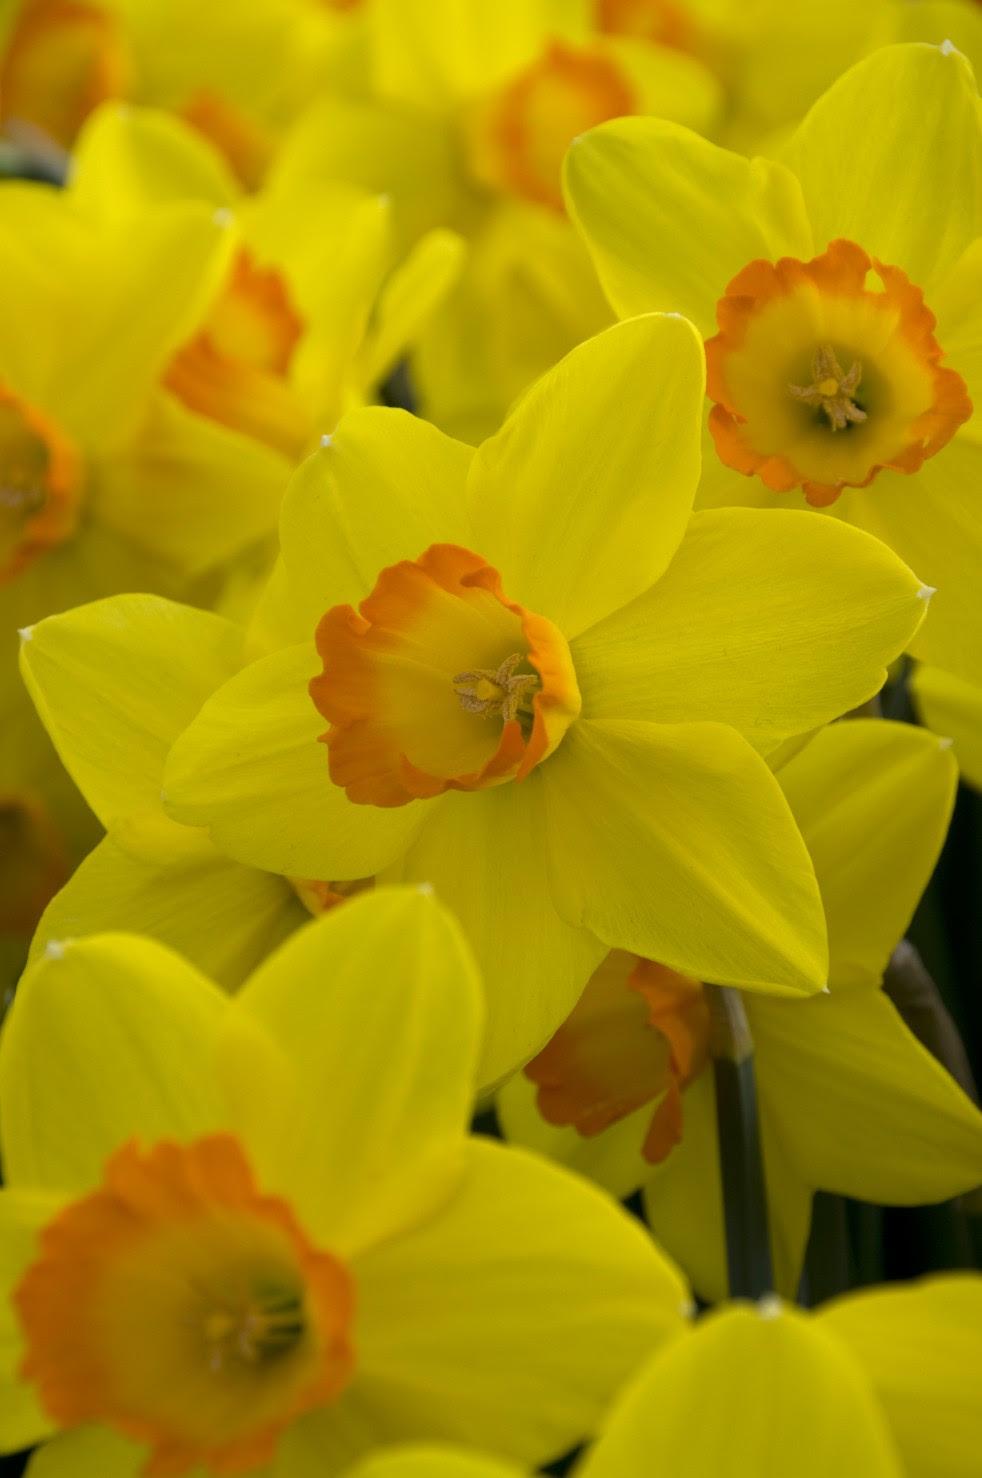 How To Grow Daffodils Planting Daffoldil Bulbs Growing Daffodils